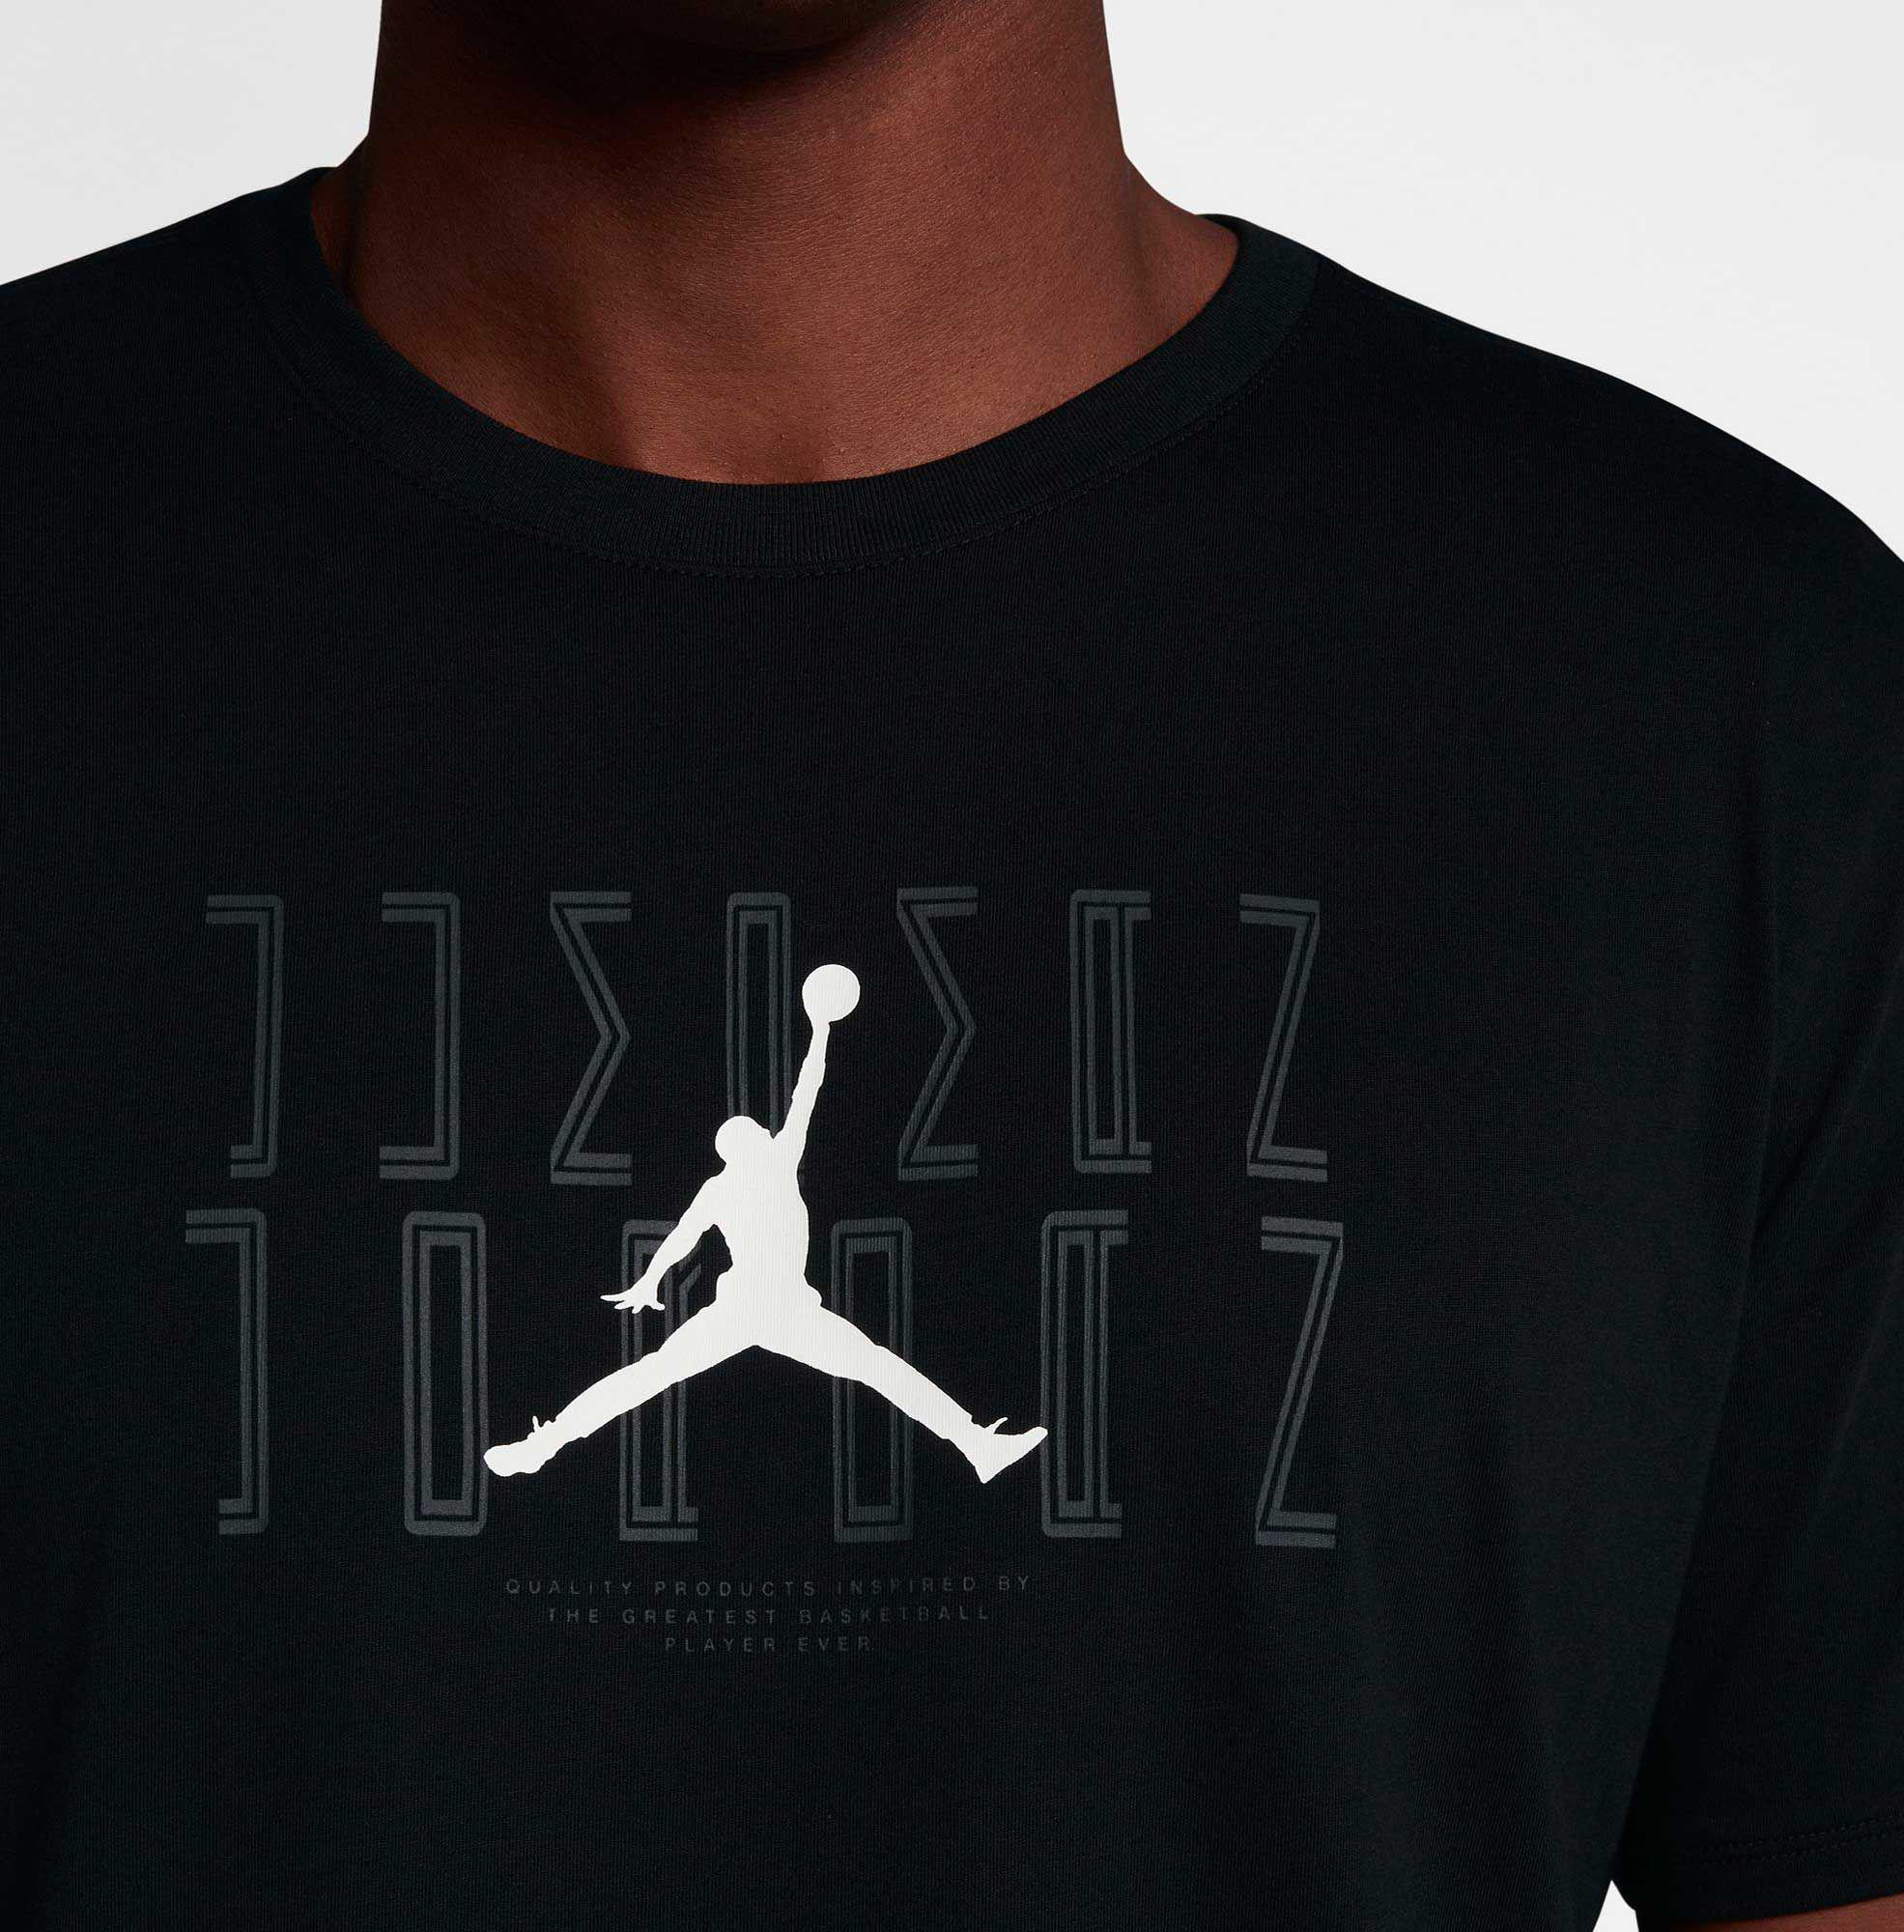 b0b8e8350797b6 Lyst - Nike Jordan Sportswear Aj 11 Graphic T-shirt in Black for Men